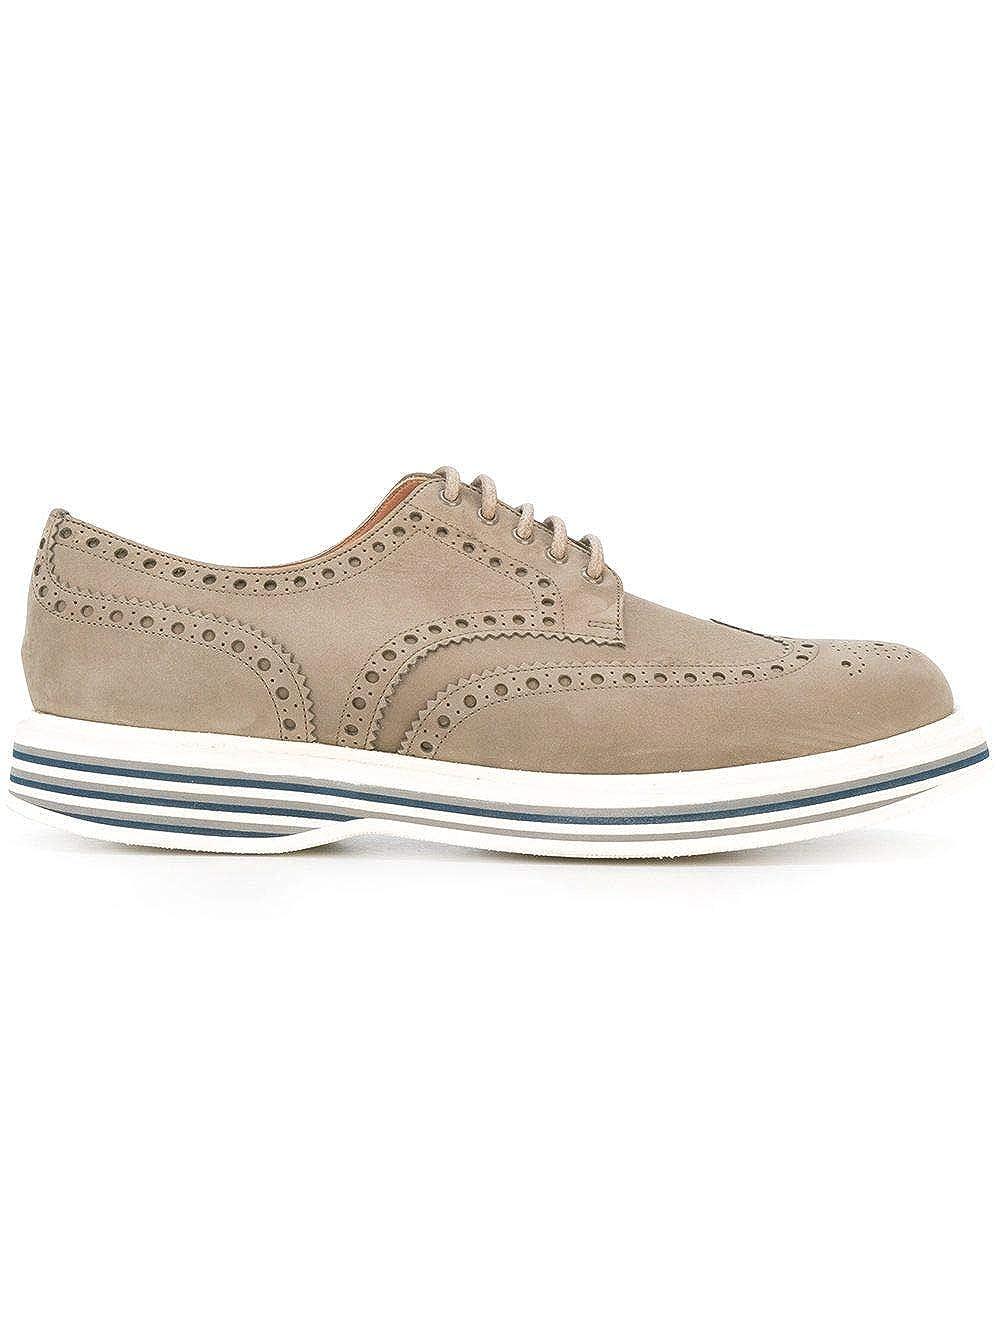 - Church's Hombre EEC0649DZF0DY9 gris Gamuza zapatos De Cordones